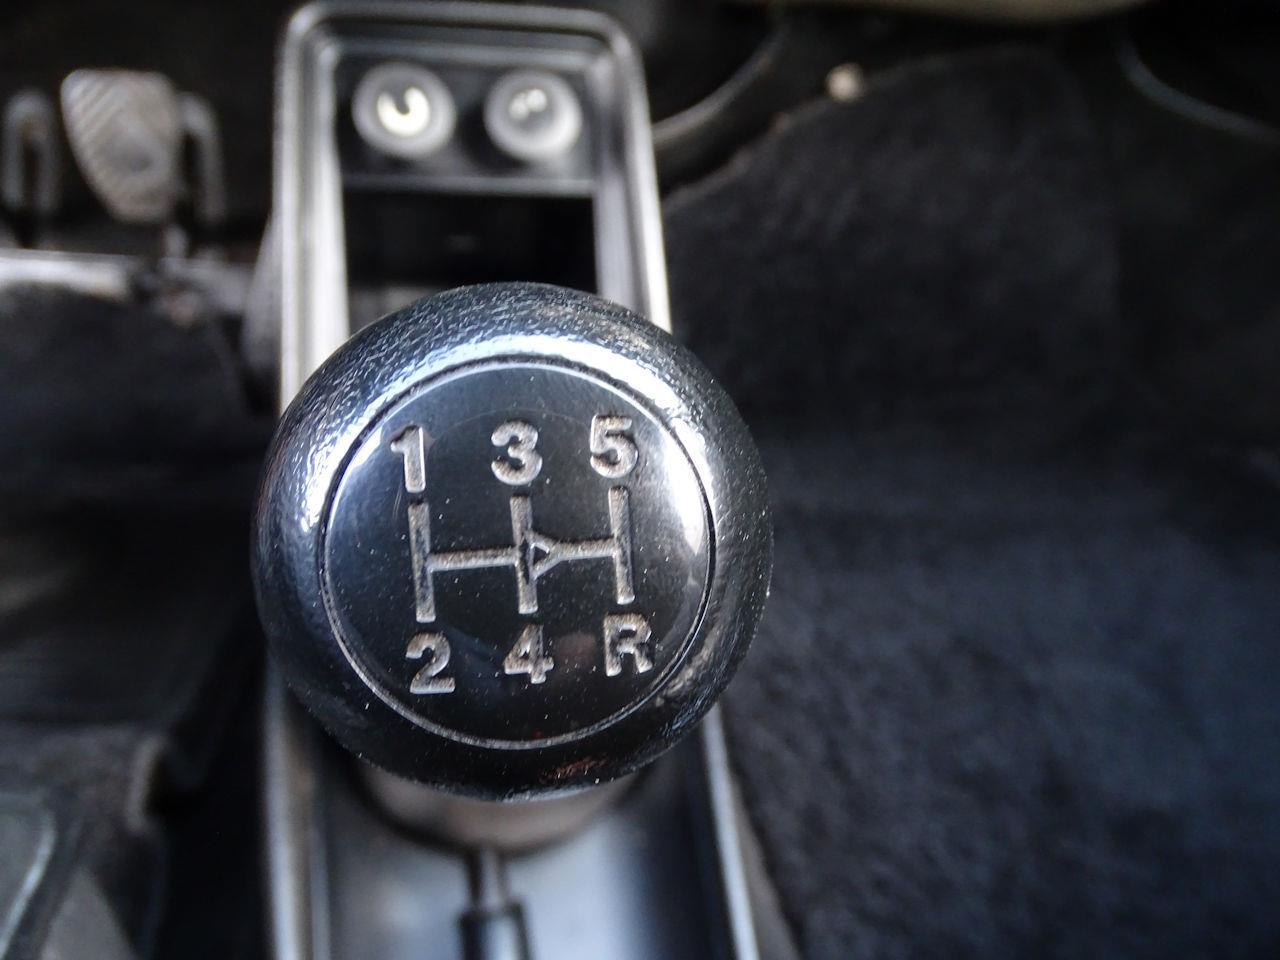 1979 Porsche 911 (CC-1414816) for sale in O'Fallon, Illinois